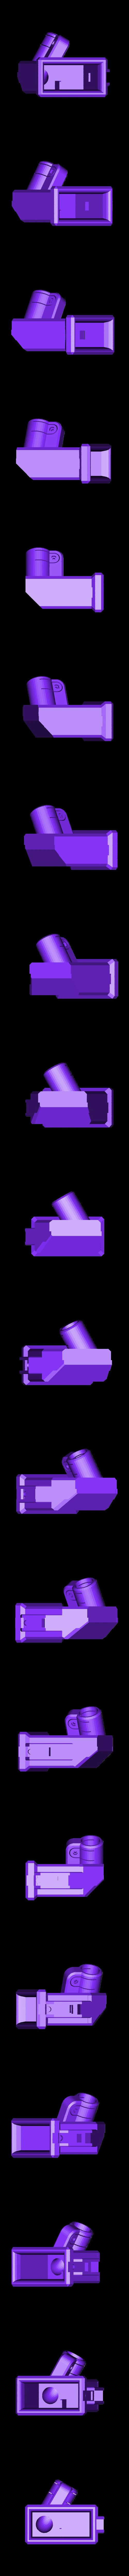 DMAG_MAGWELL_PUMP_M2.stl Télécharger fichier STL gratuit DMAG Helix Adapter Maverick, Trracer pump paintball • Objet imprimable en 3D, UntangleART